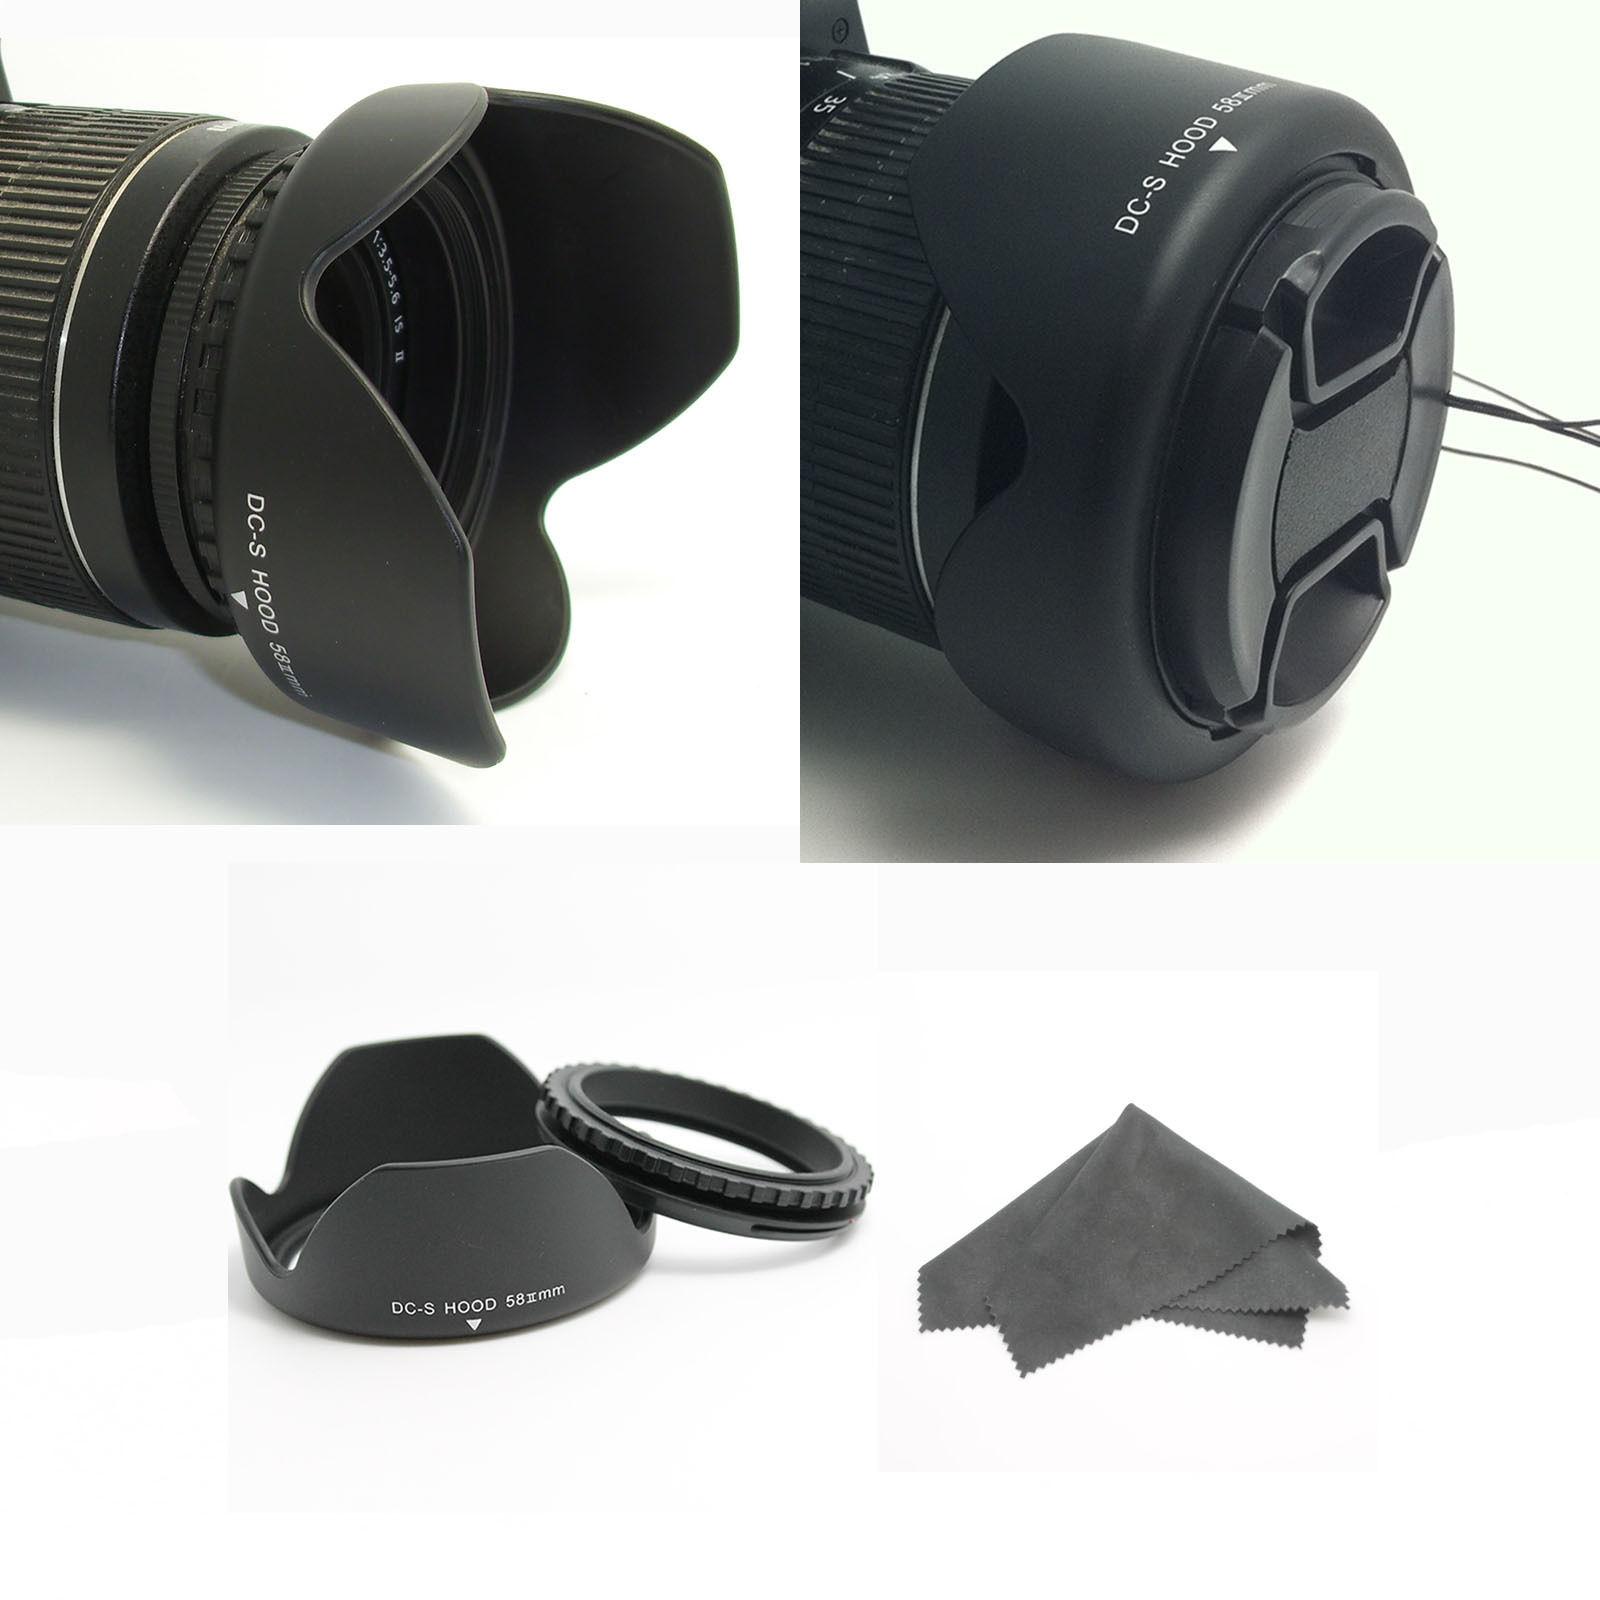 Sher Camera Rentals Store Lens Hood For Cameras 52mm Screw Mount 58mm Reversible Petal Flower Ii Canon 18x55mm 650